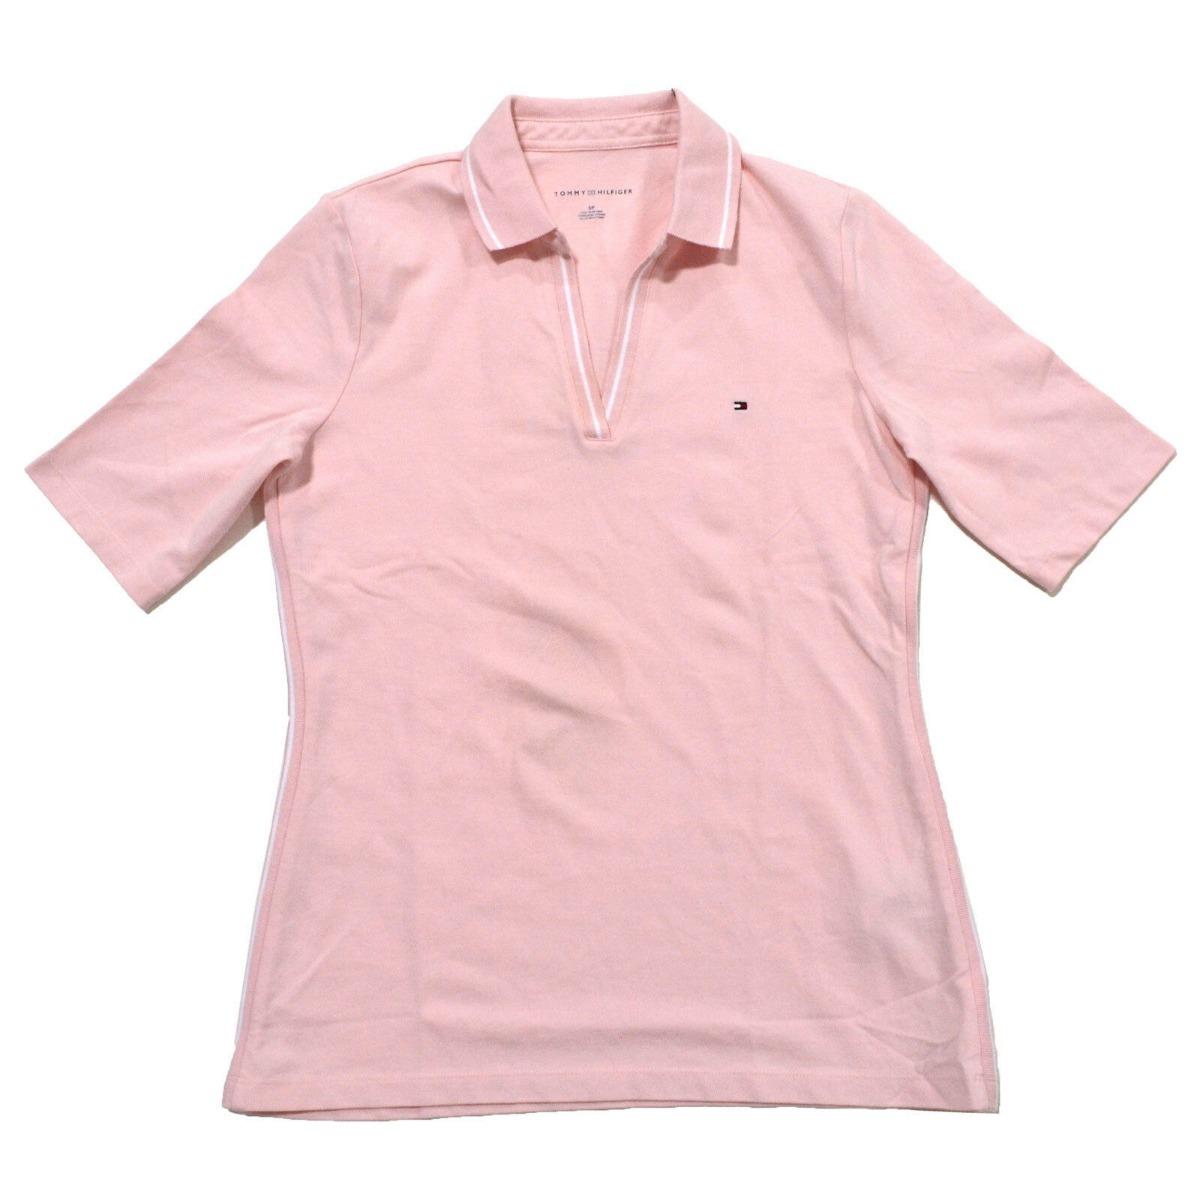 d68ebeabdd9 tommy hilfiger blusa tipo polo en v 100% original talla xl. Cargando zoom.